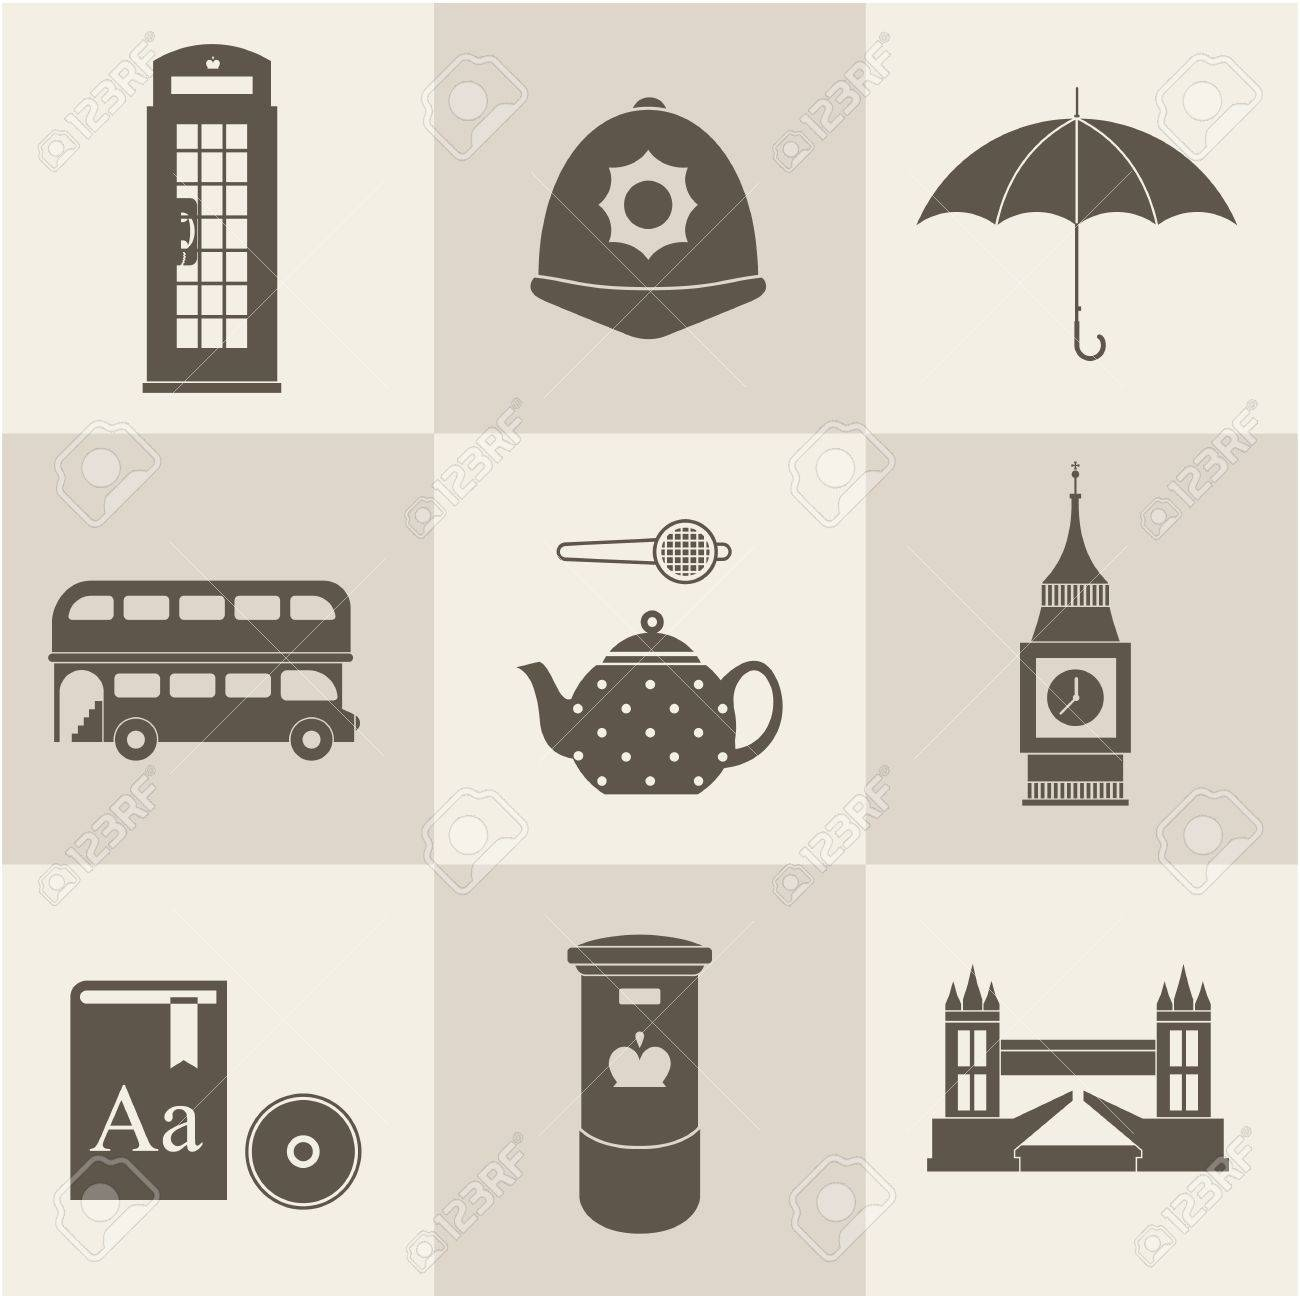 London vintage icons vectors Stock Vector - 24540758